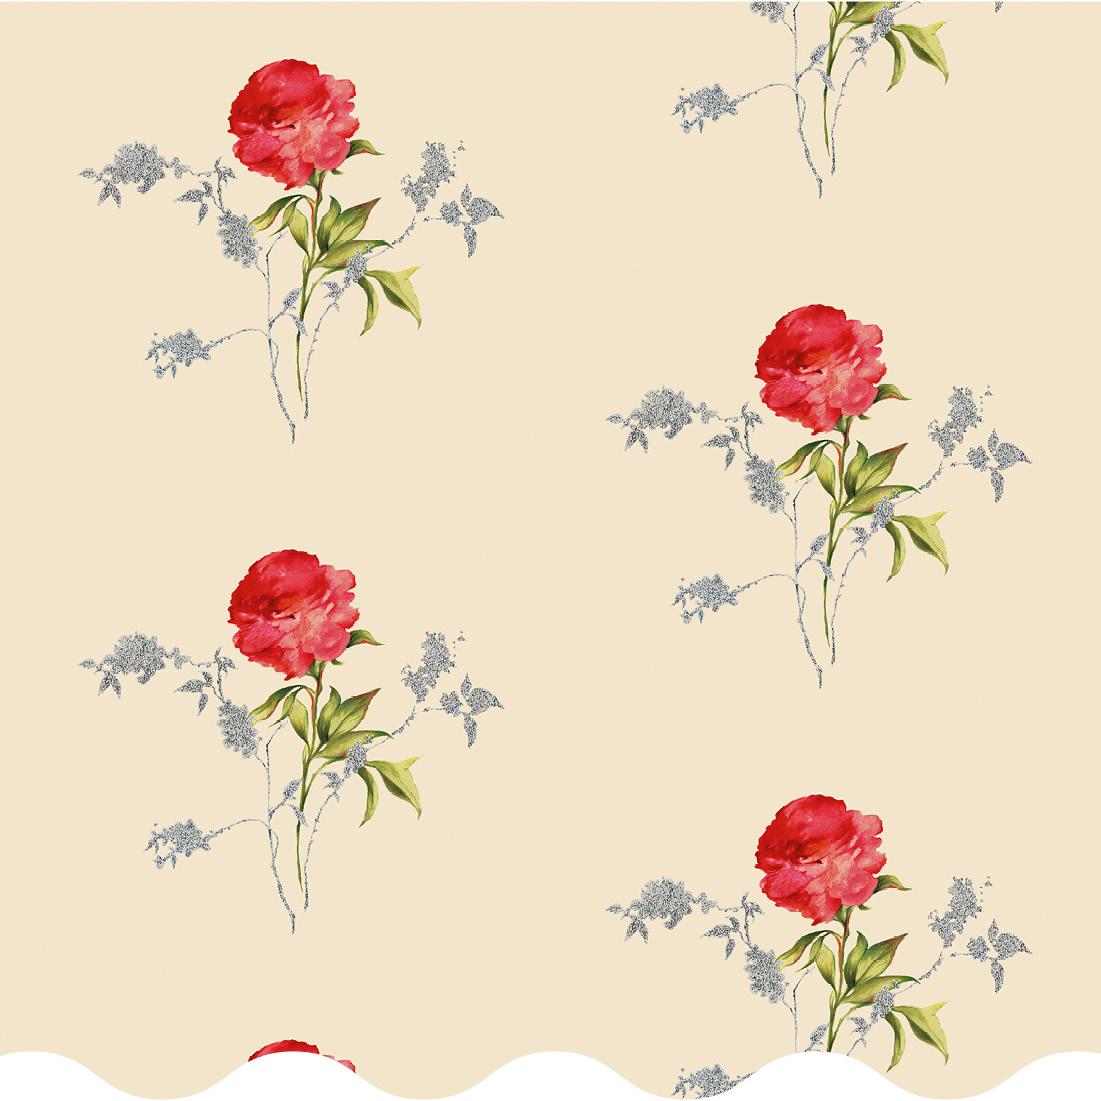 nyfan_1577_roses